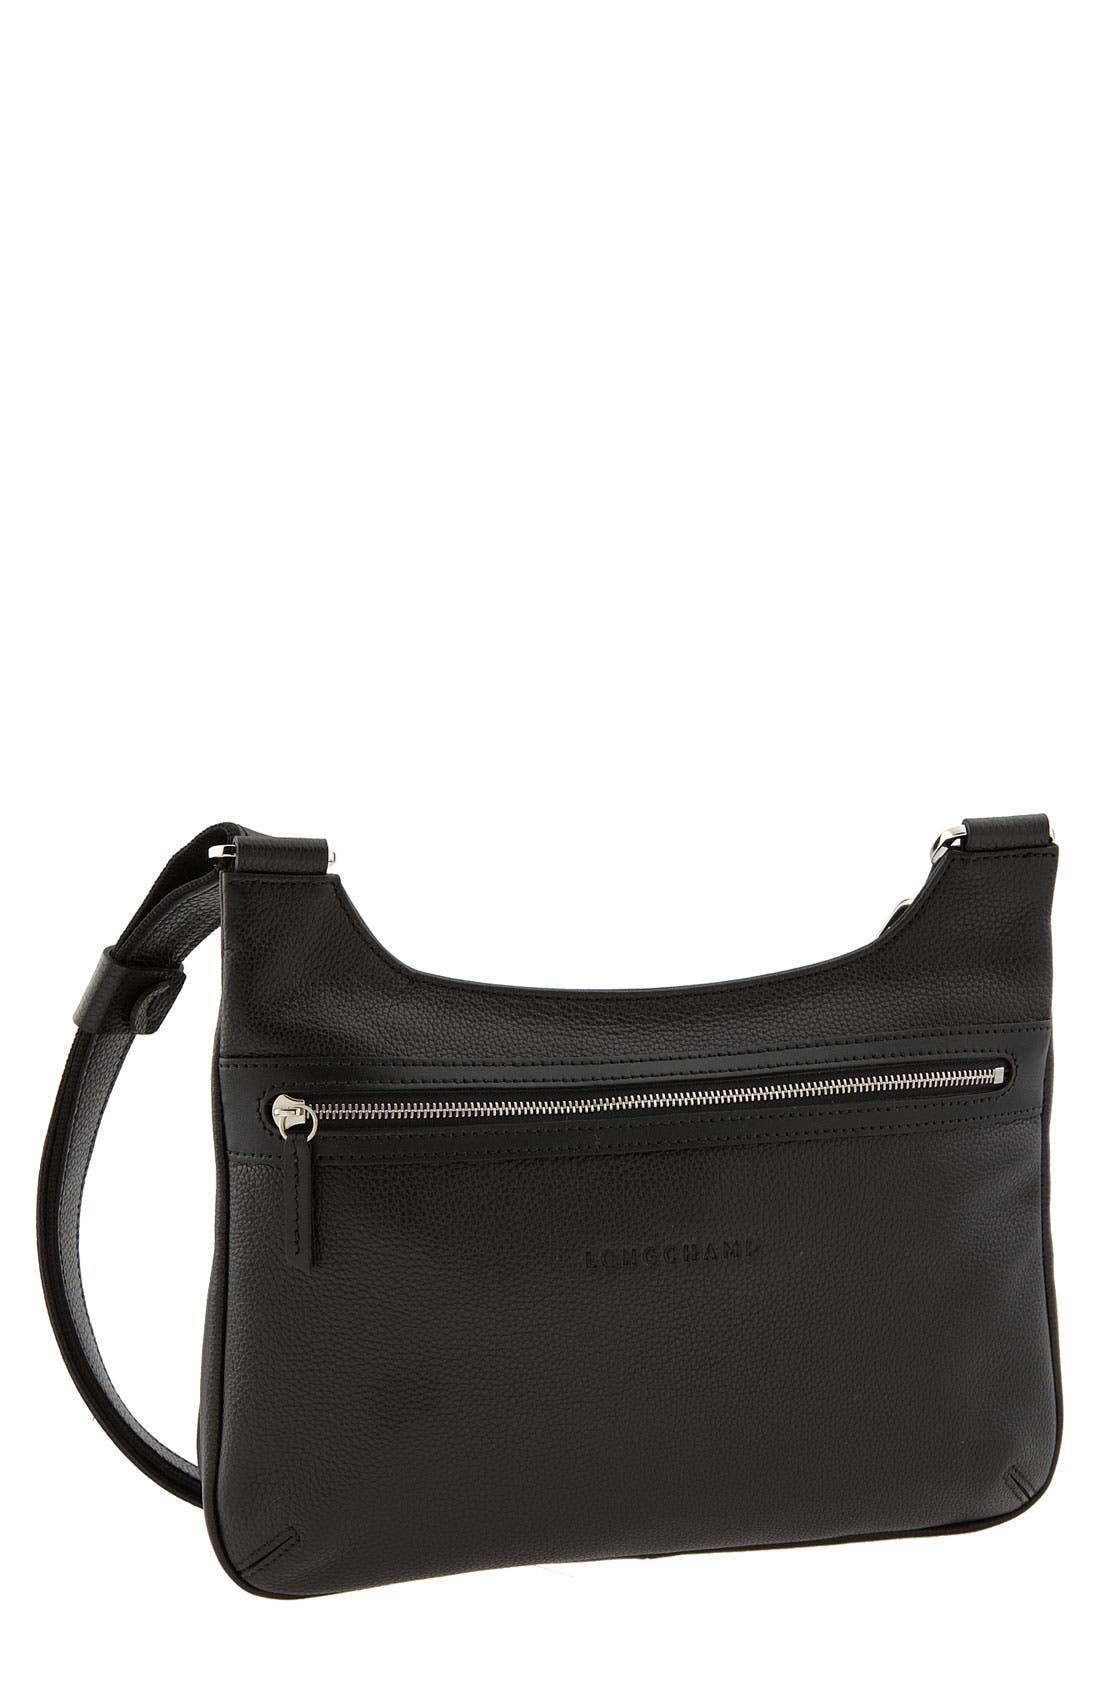 'Veau Foulonne' Crossbody Bag,                             Main thumbnail 1, color,                             002